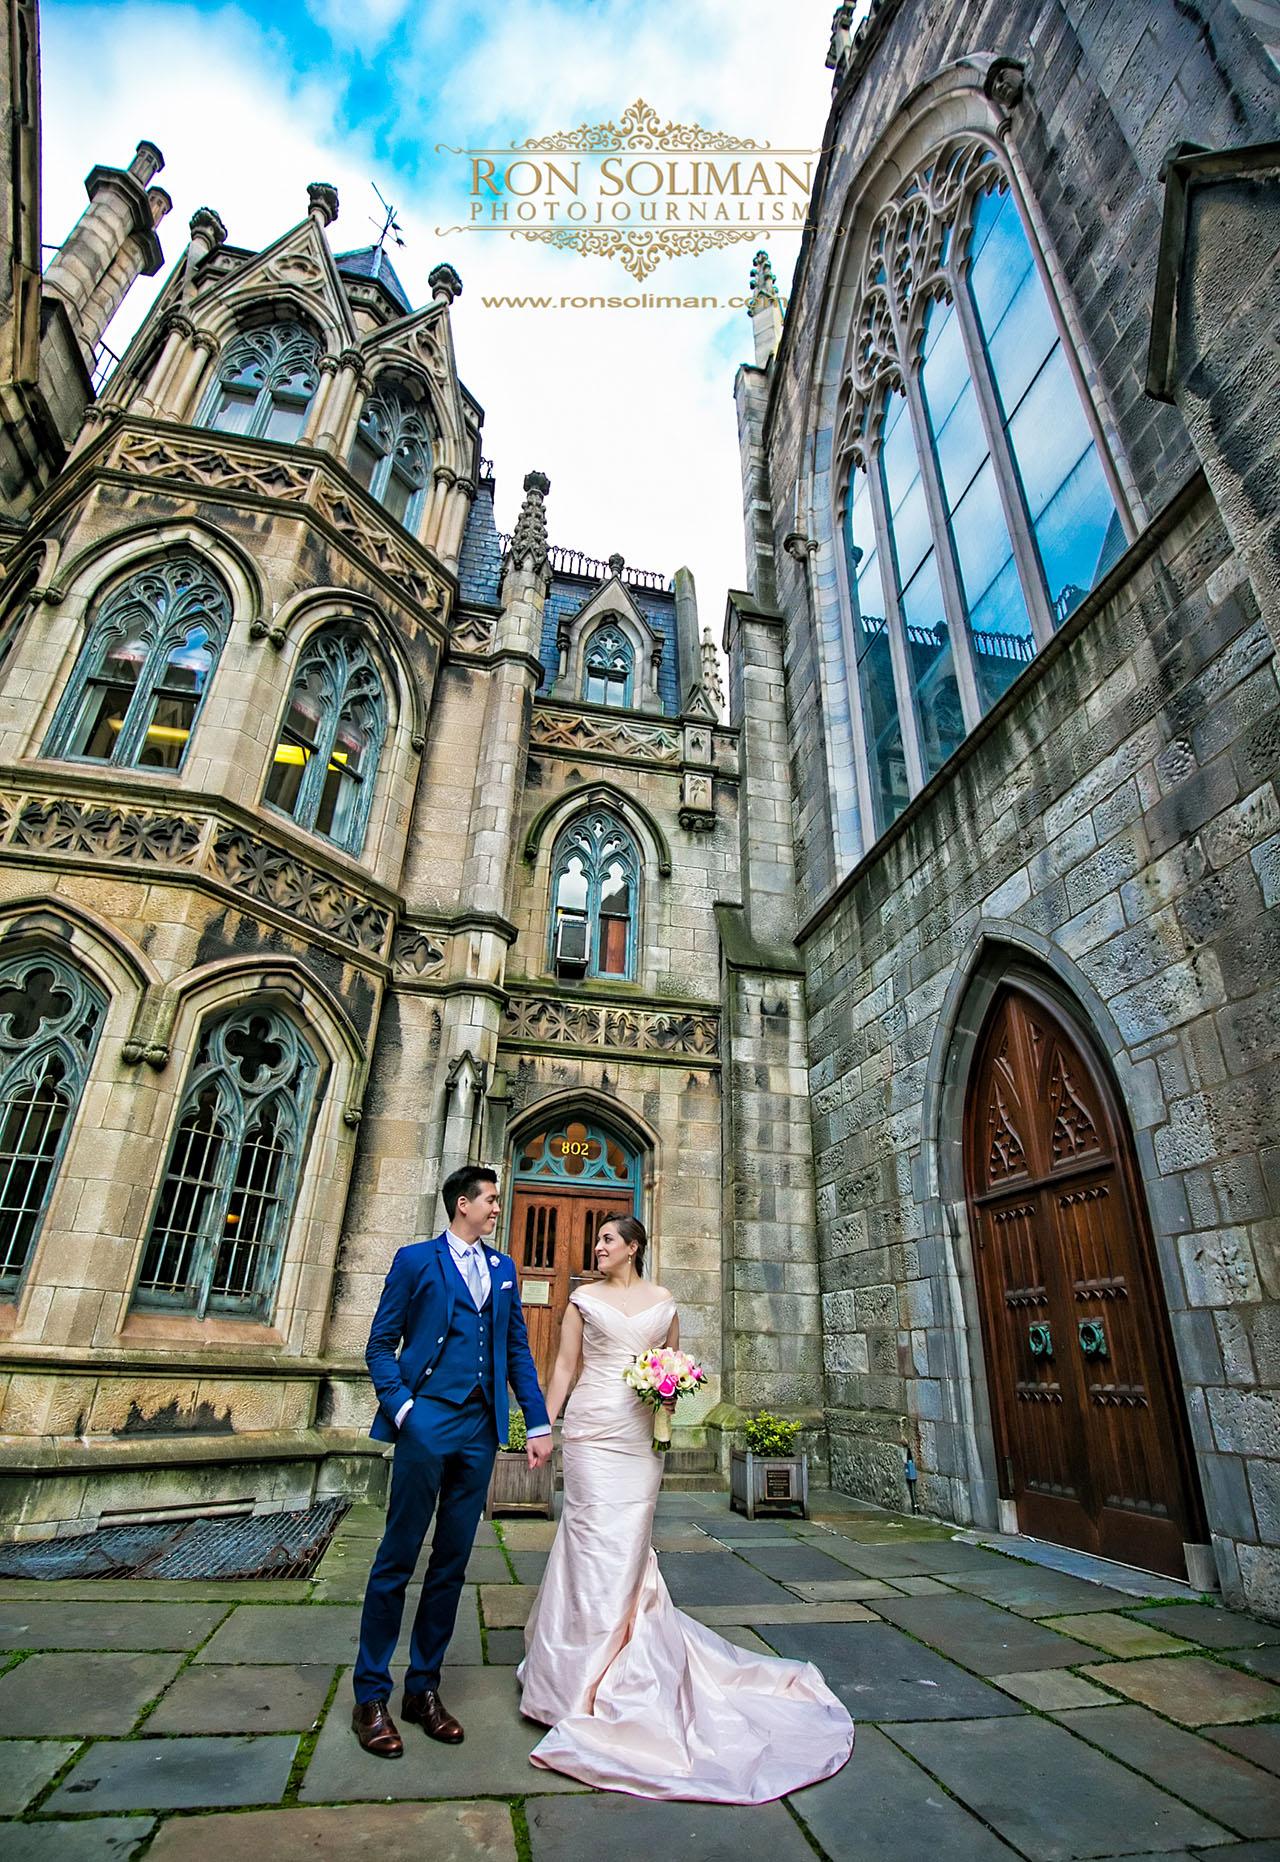 LIGHTHOUSE CHELSEA PIERS WEDDING 25